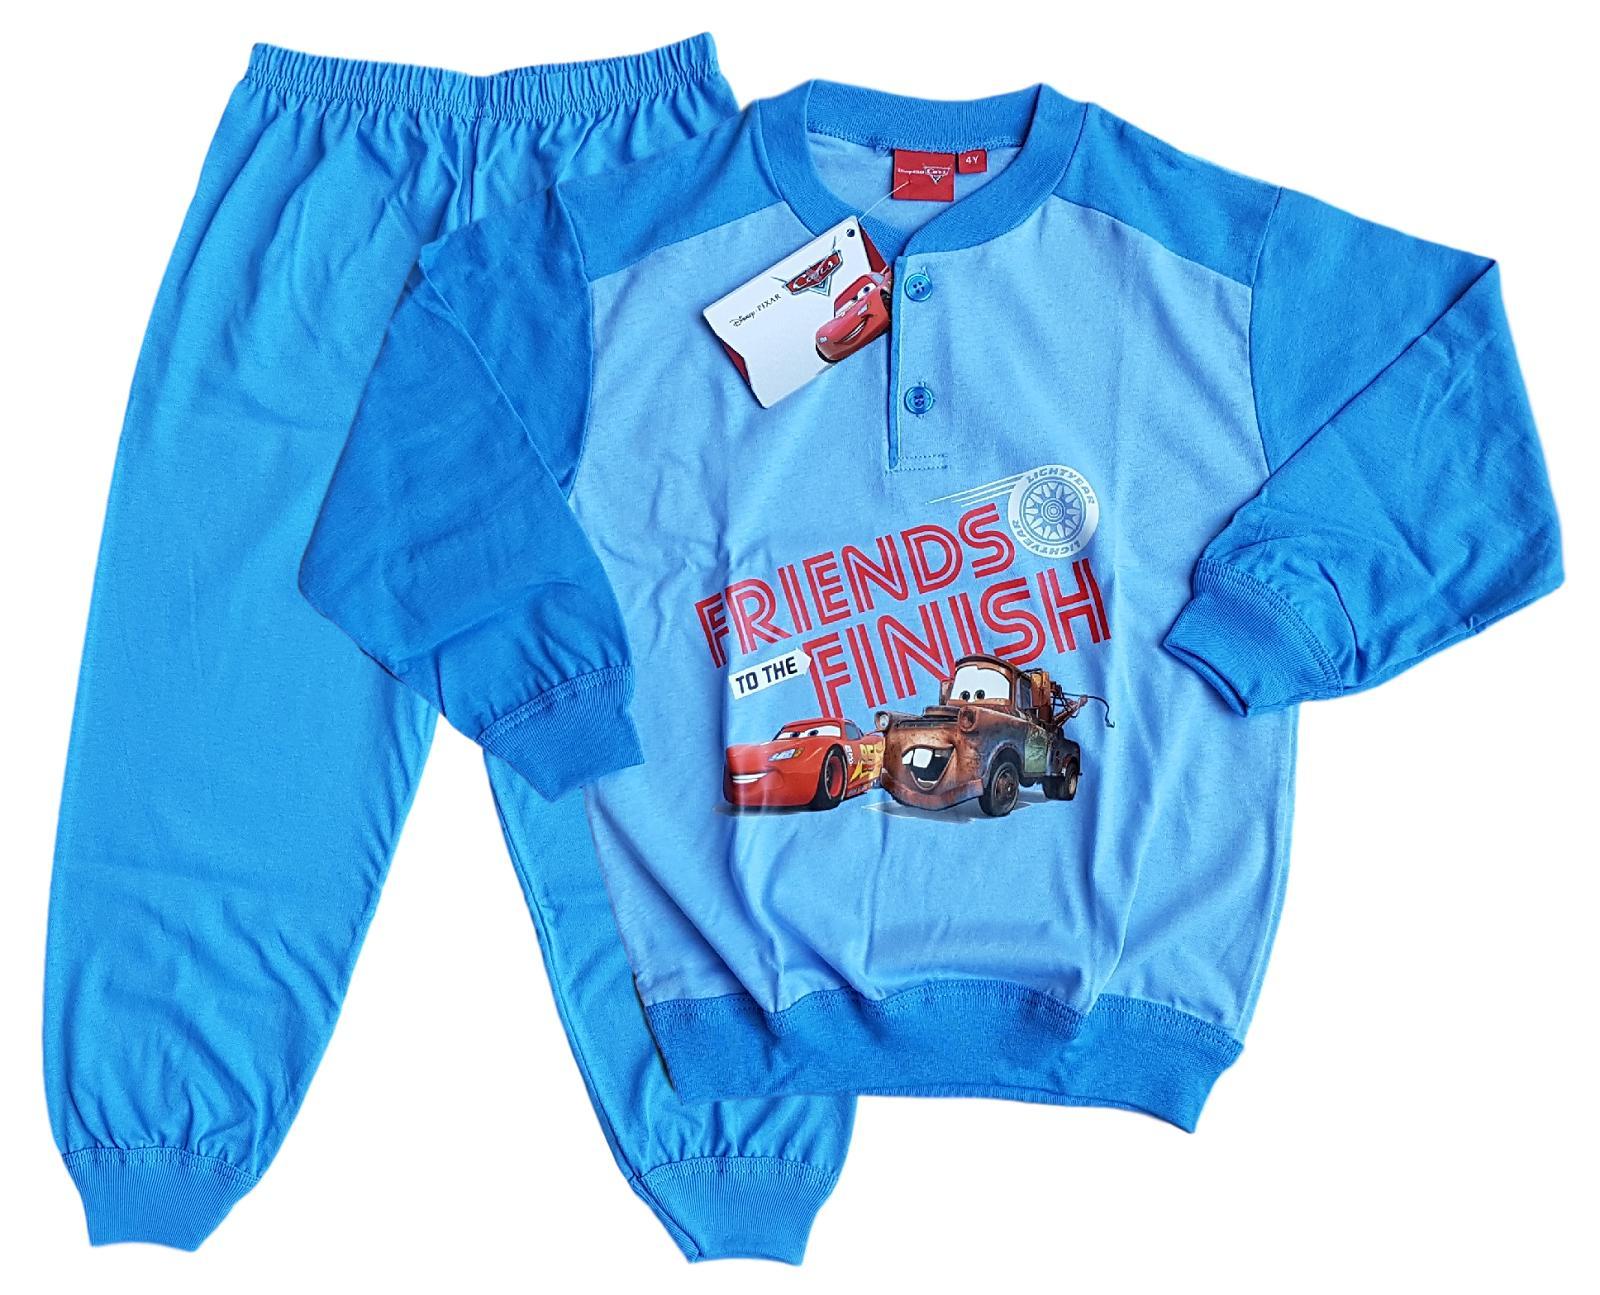 Pigiama lungo Bambino in Cotone Jersey Disney CARS EWDB290 Bimbo mod. Serafino